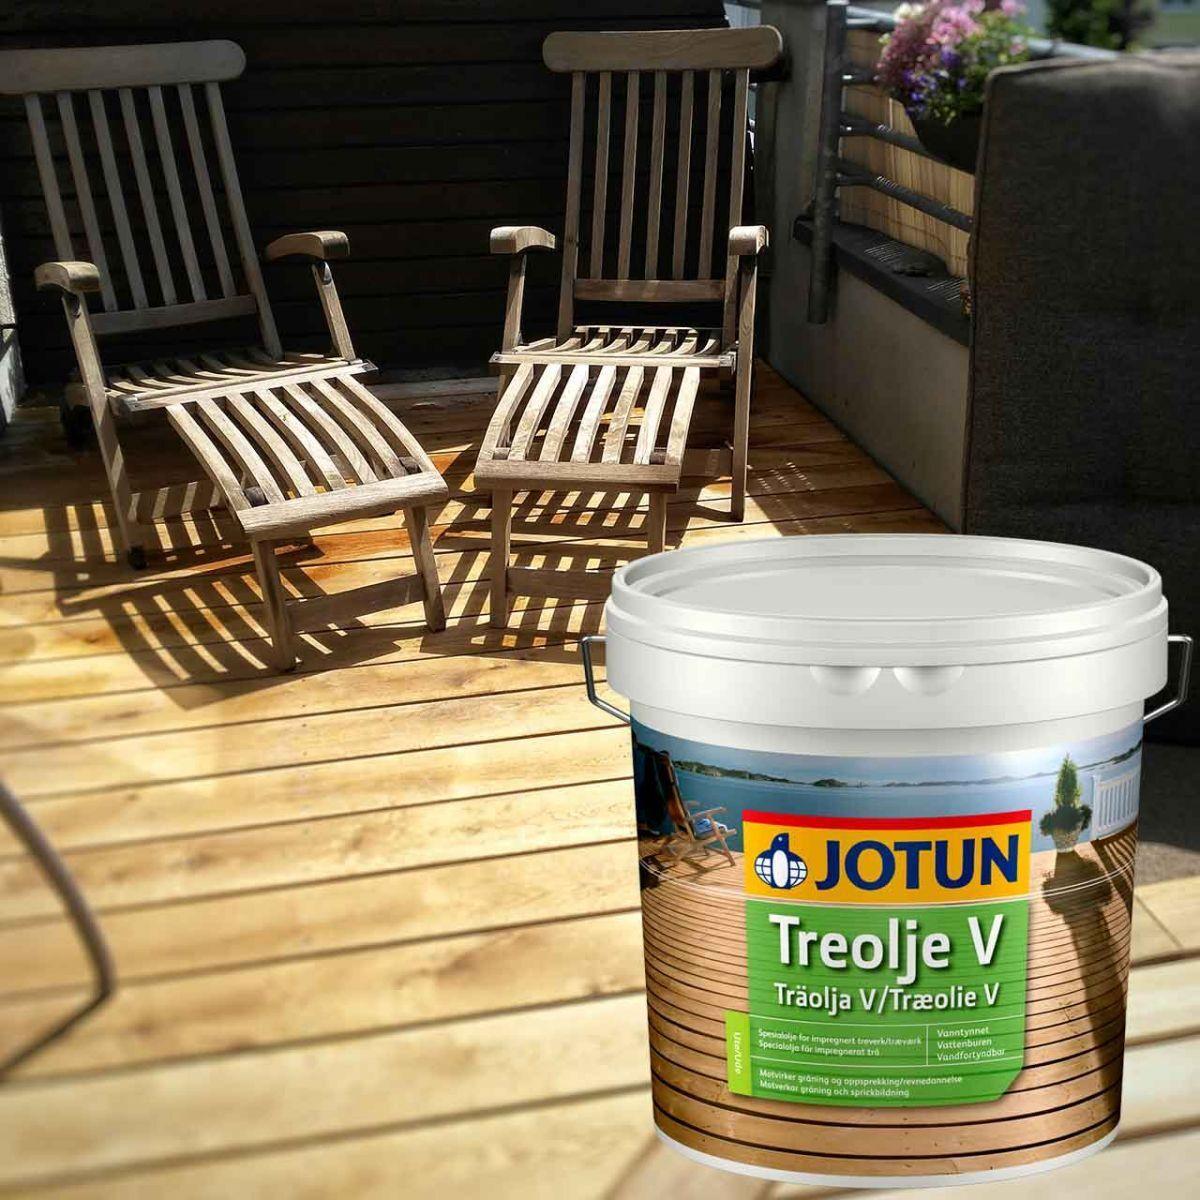 JOTUN TREOLJE Holzöl Gold / gylden 3l - pigmentiertes Gartenholzöl Holzschutzöl